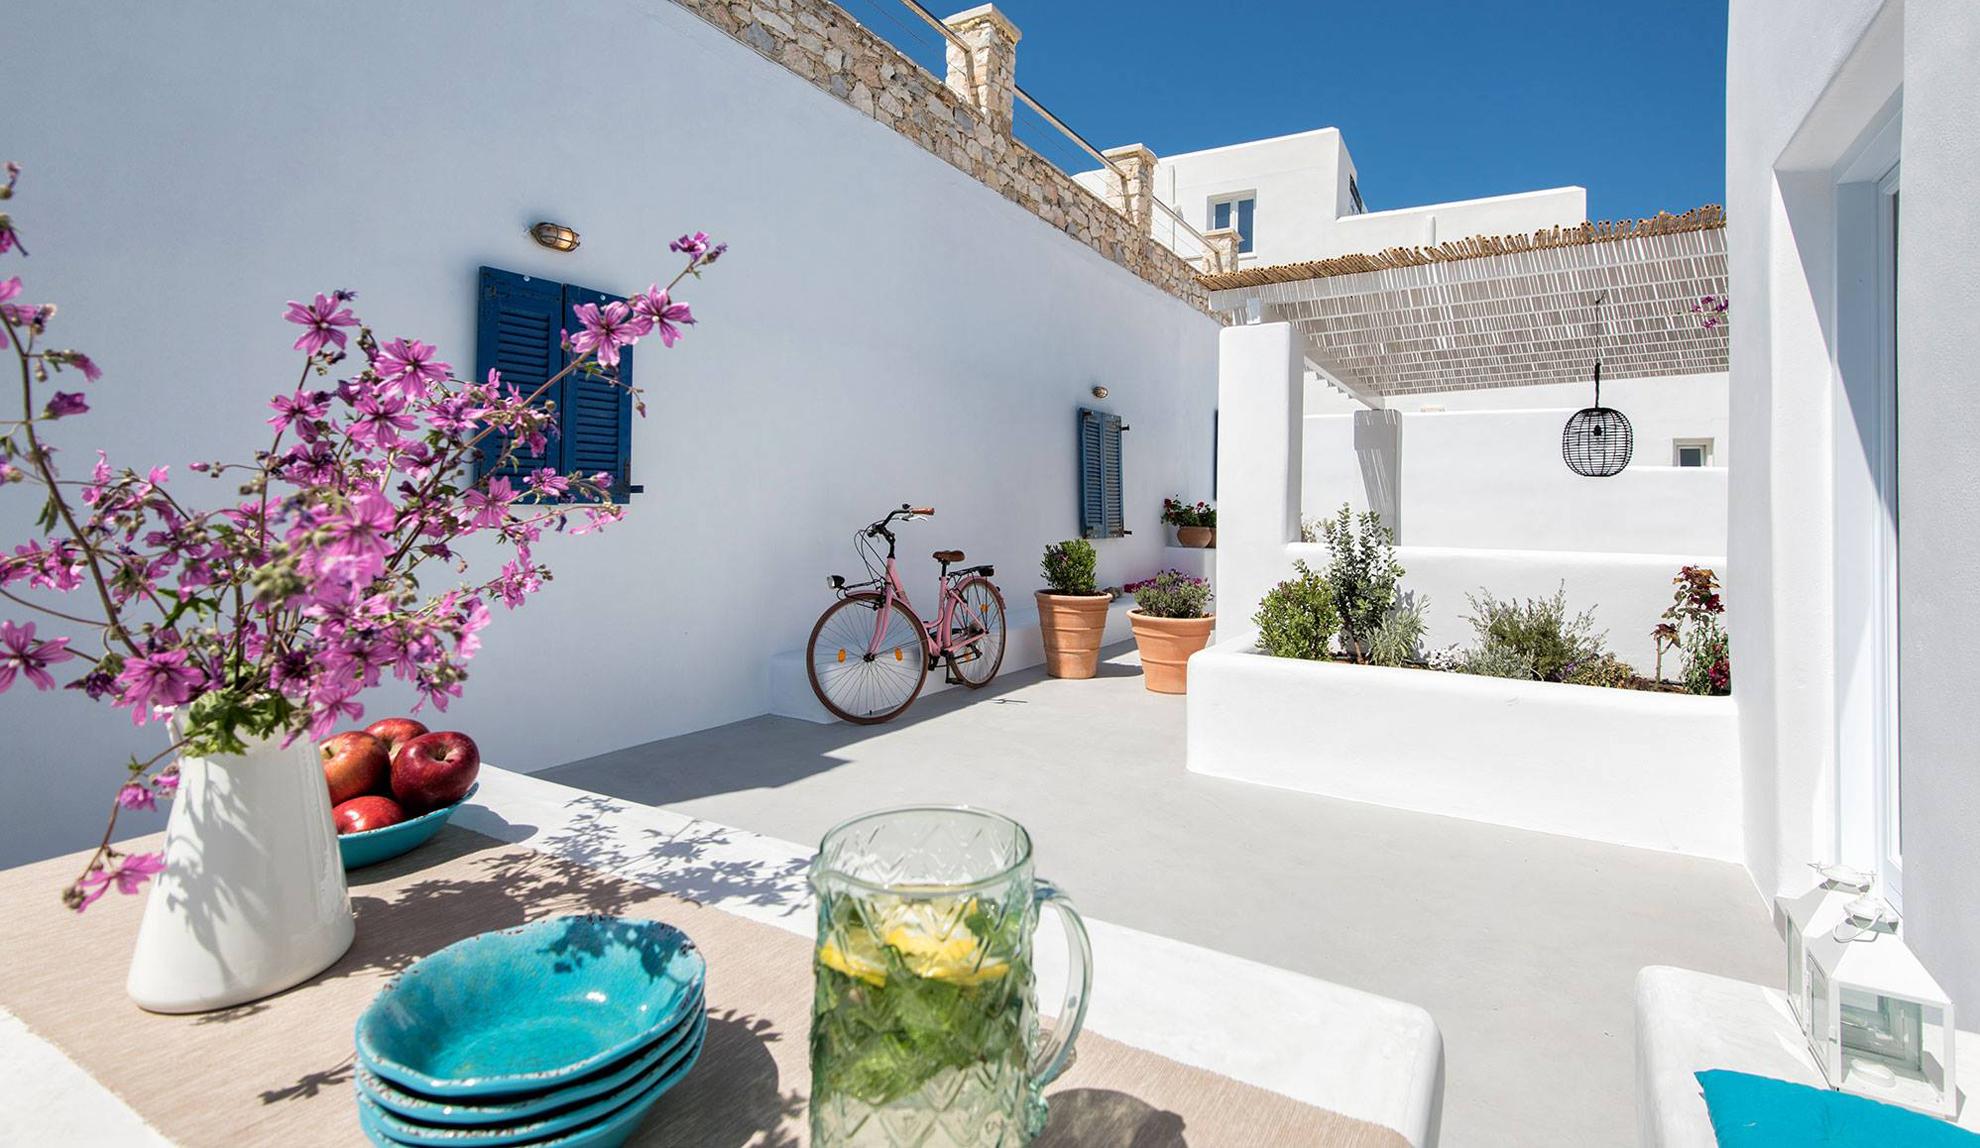 House in Greece, Israeli Design